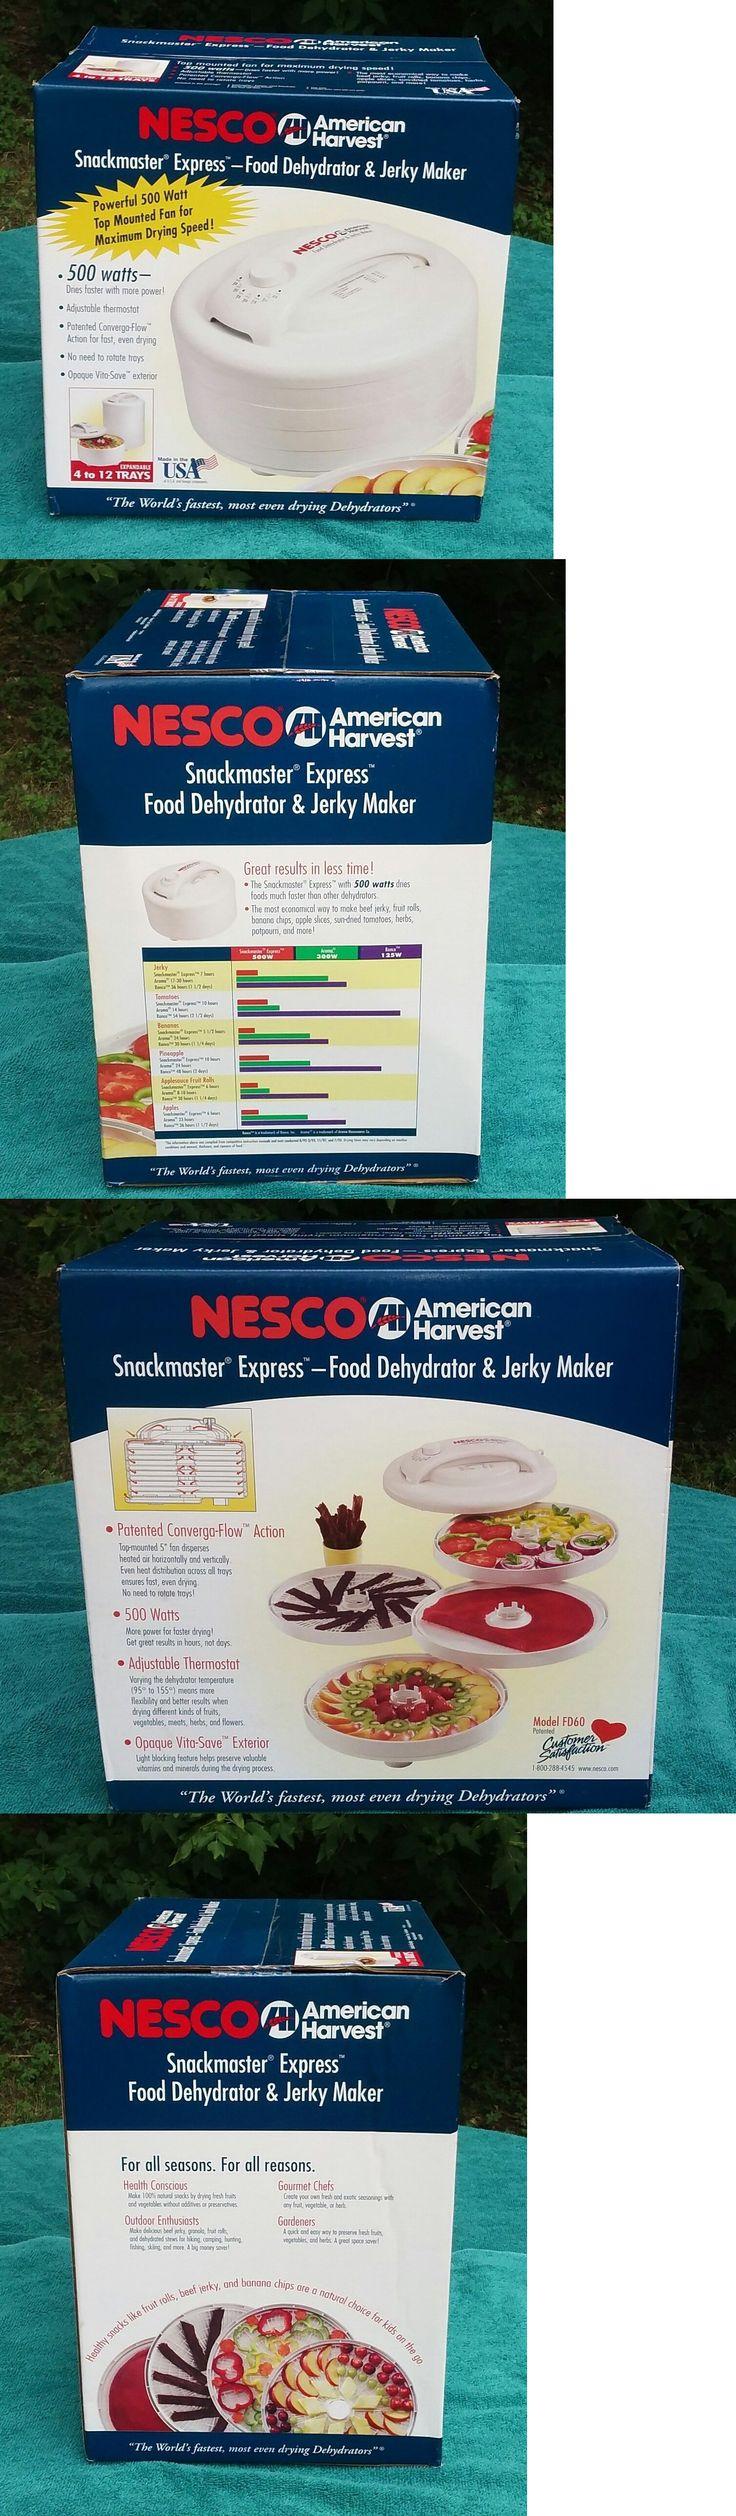 Food Dehydrators 32883: Nesco American Harvest Food Dehydrator And Jerky Maker New -> BUY IT NOW ONLY: $49.99 on eBay!